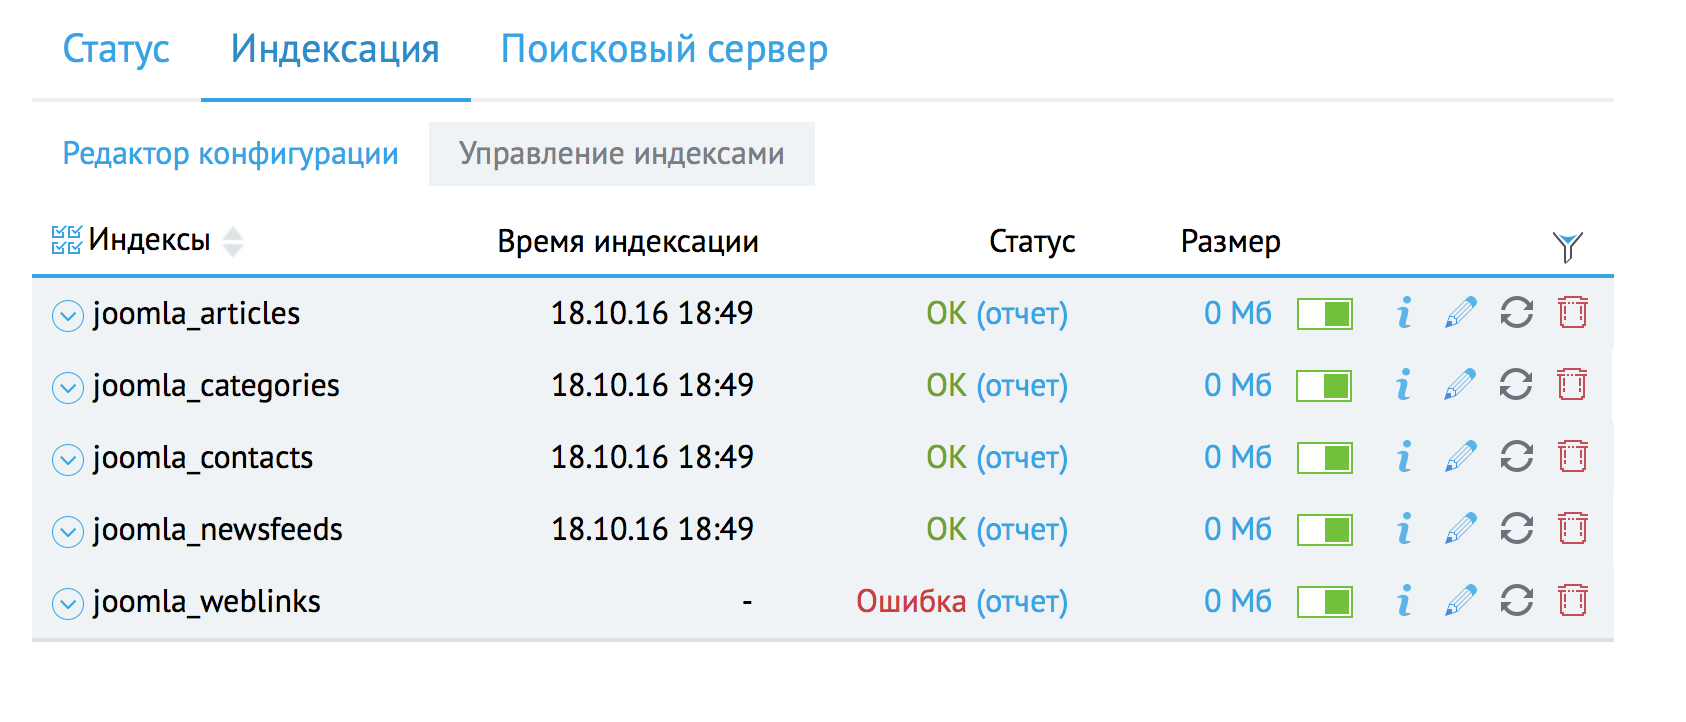 включение sphinx в панели управления cp.beget.com